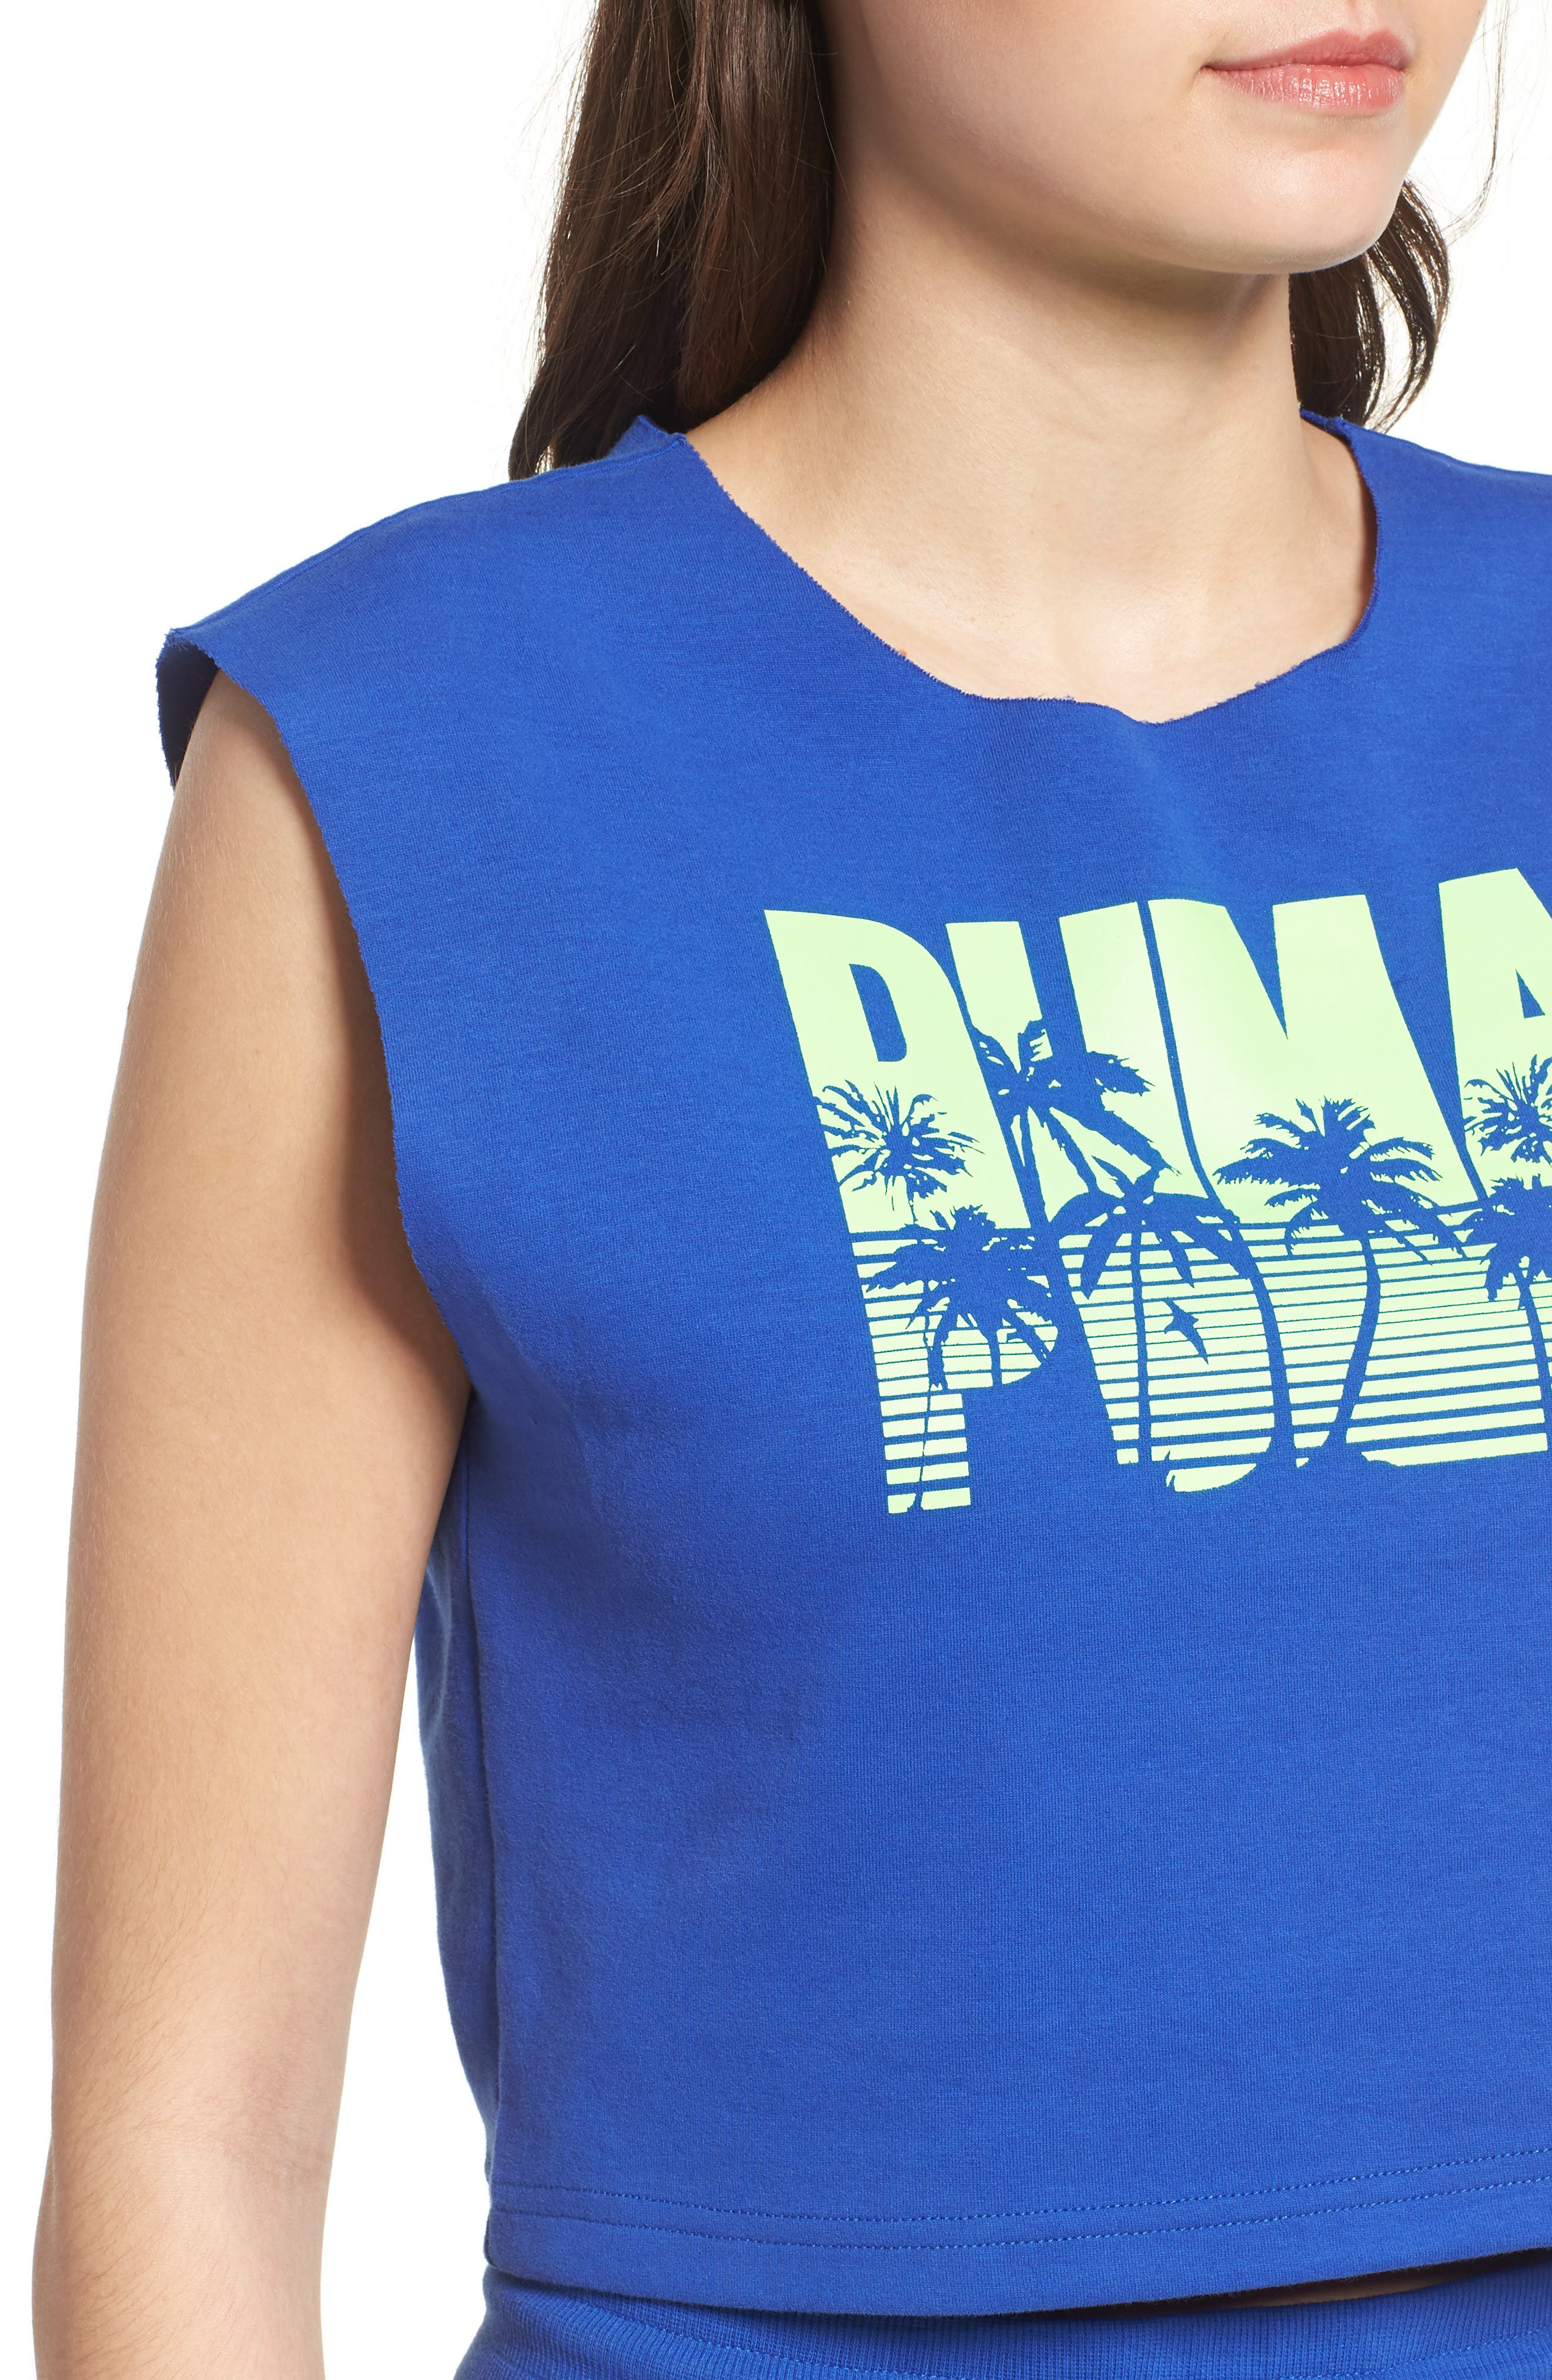 PUMA,                             FENTY PUMA by Rihanna Logo Crop Top,                             Alternate thumbnail 4, color,                             400